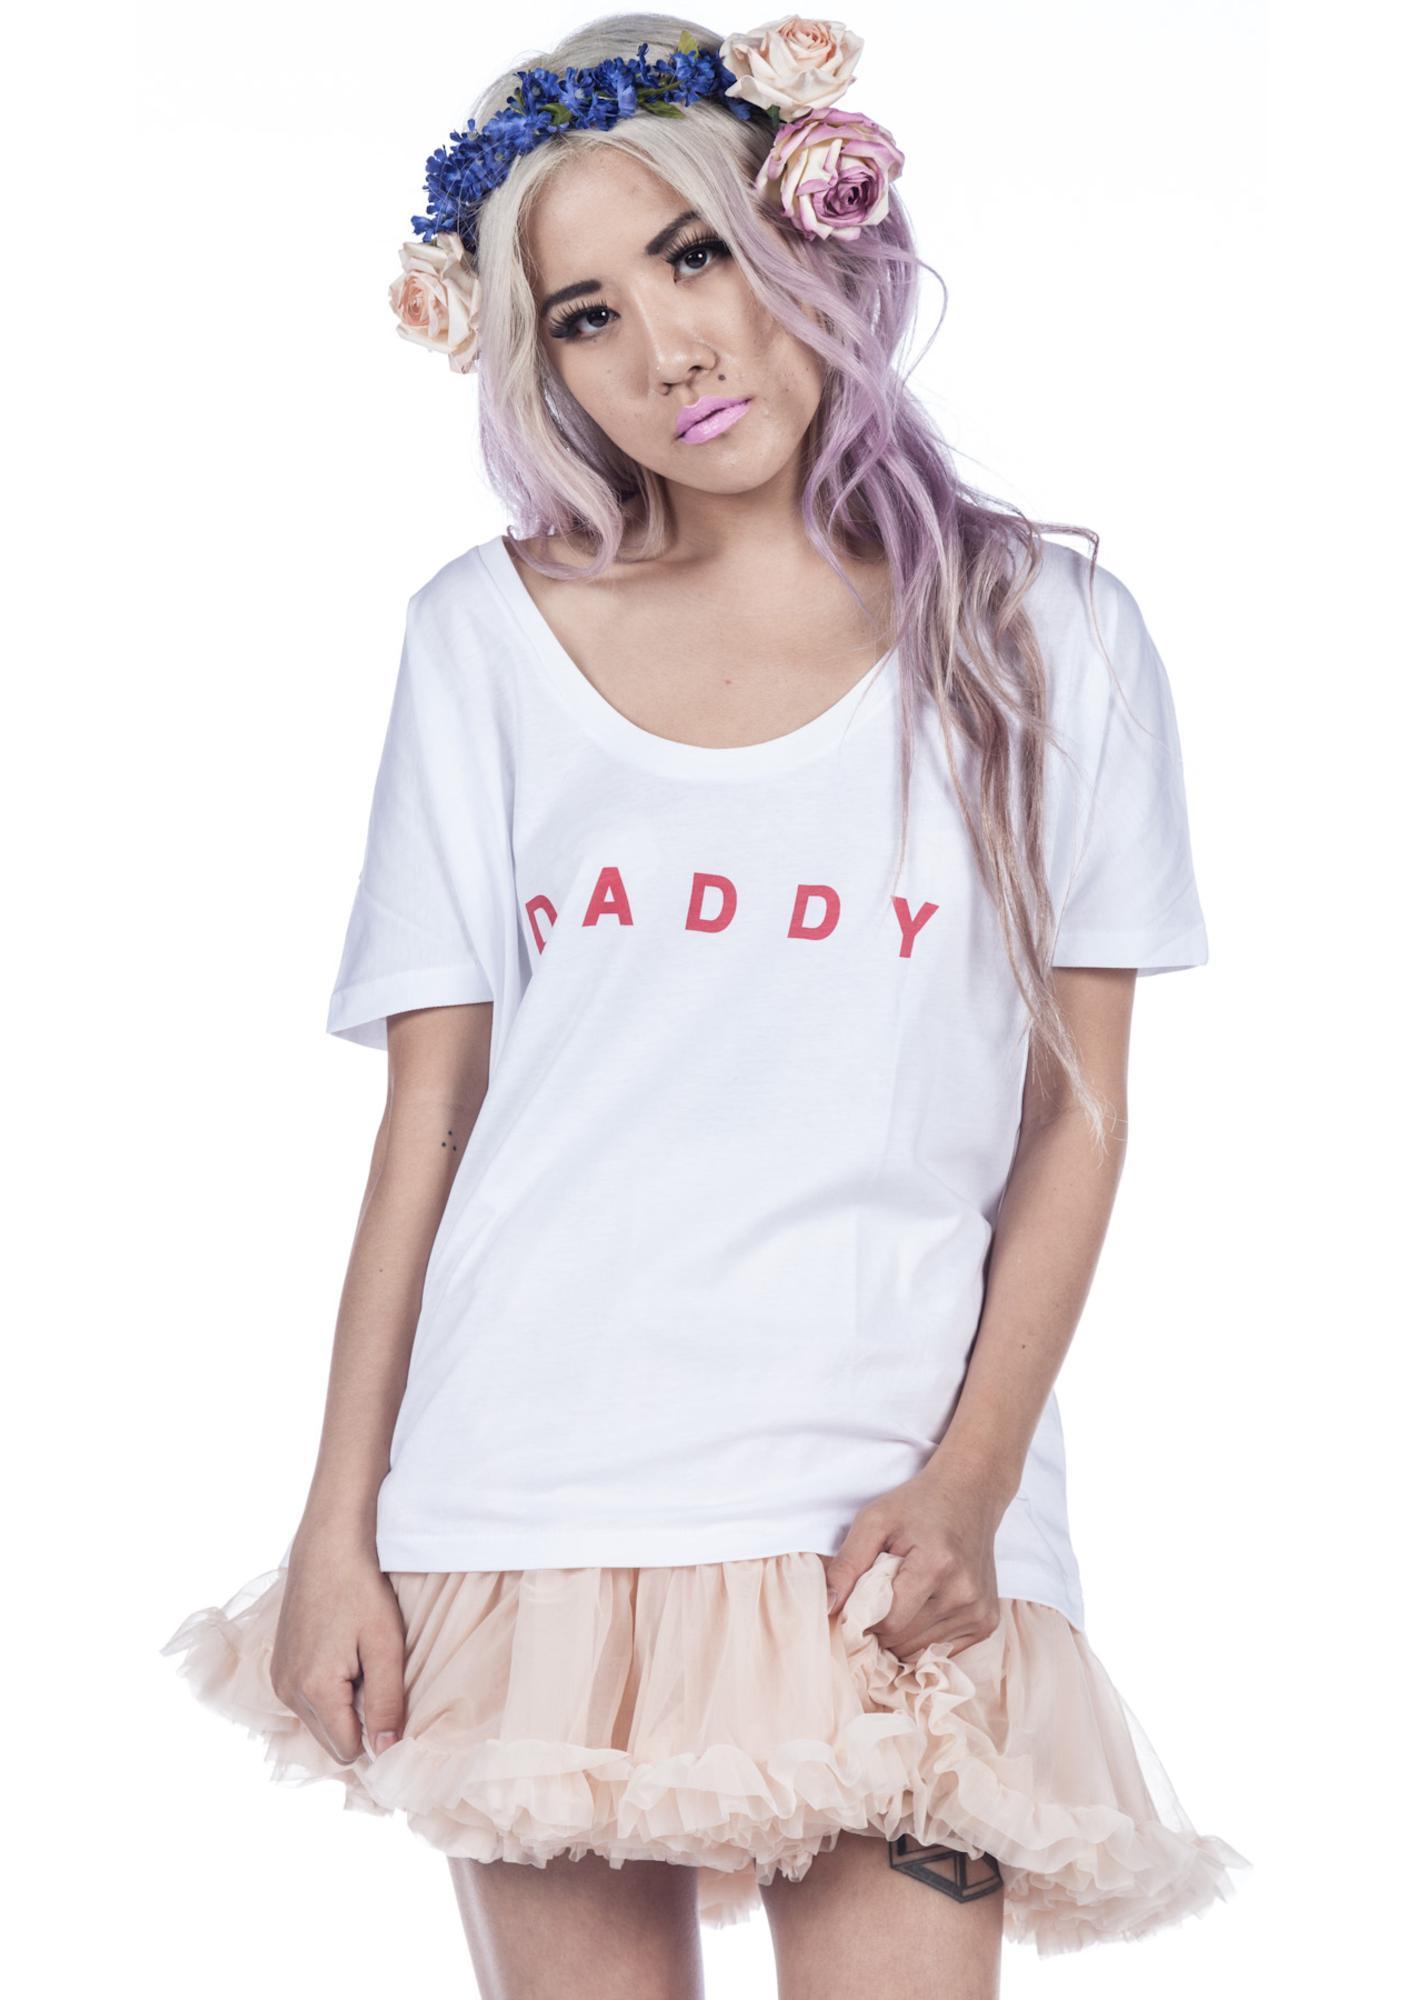 Daddy Tee